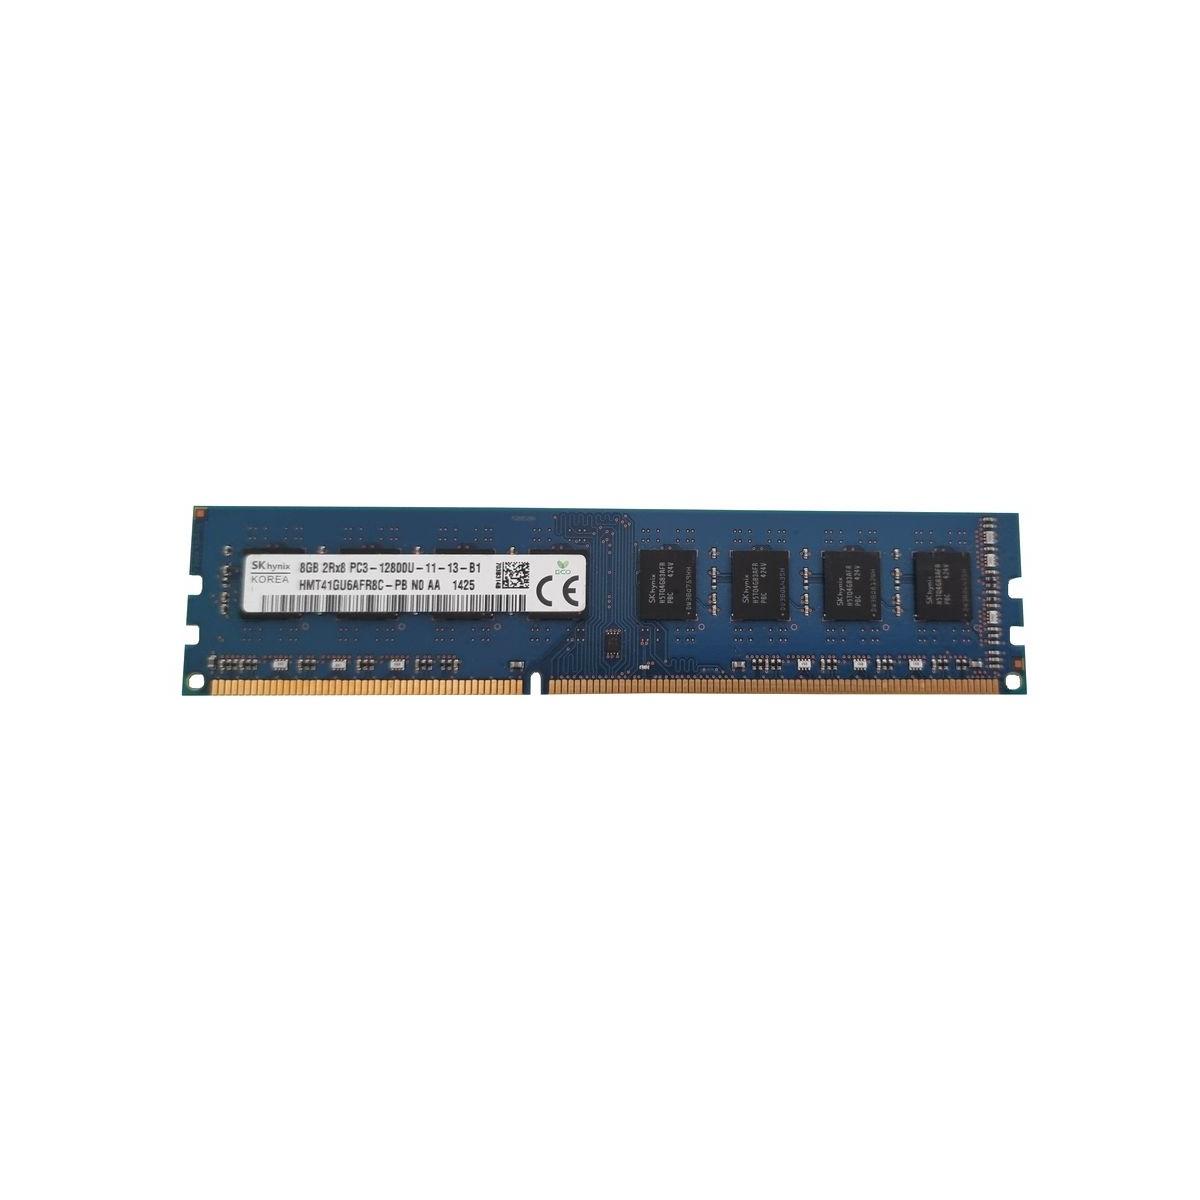 KABEL IBM x3650 m4 ODD SATA OPTICAL DRIVE 00D4048